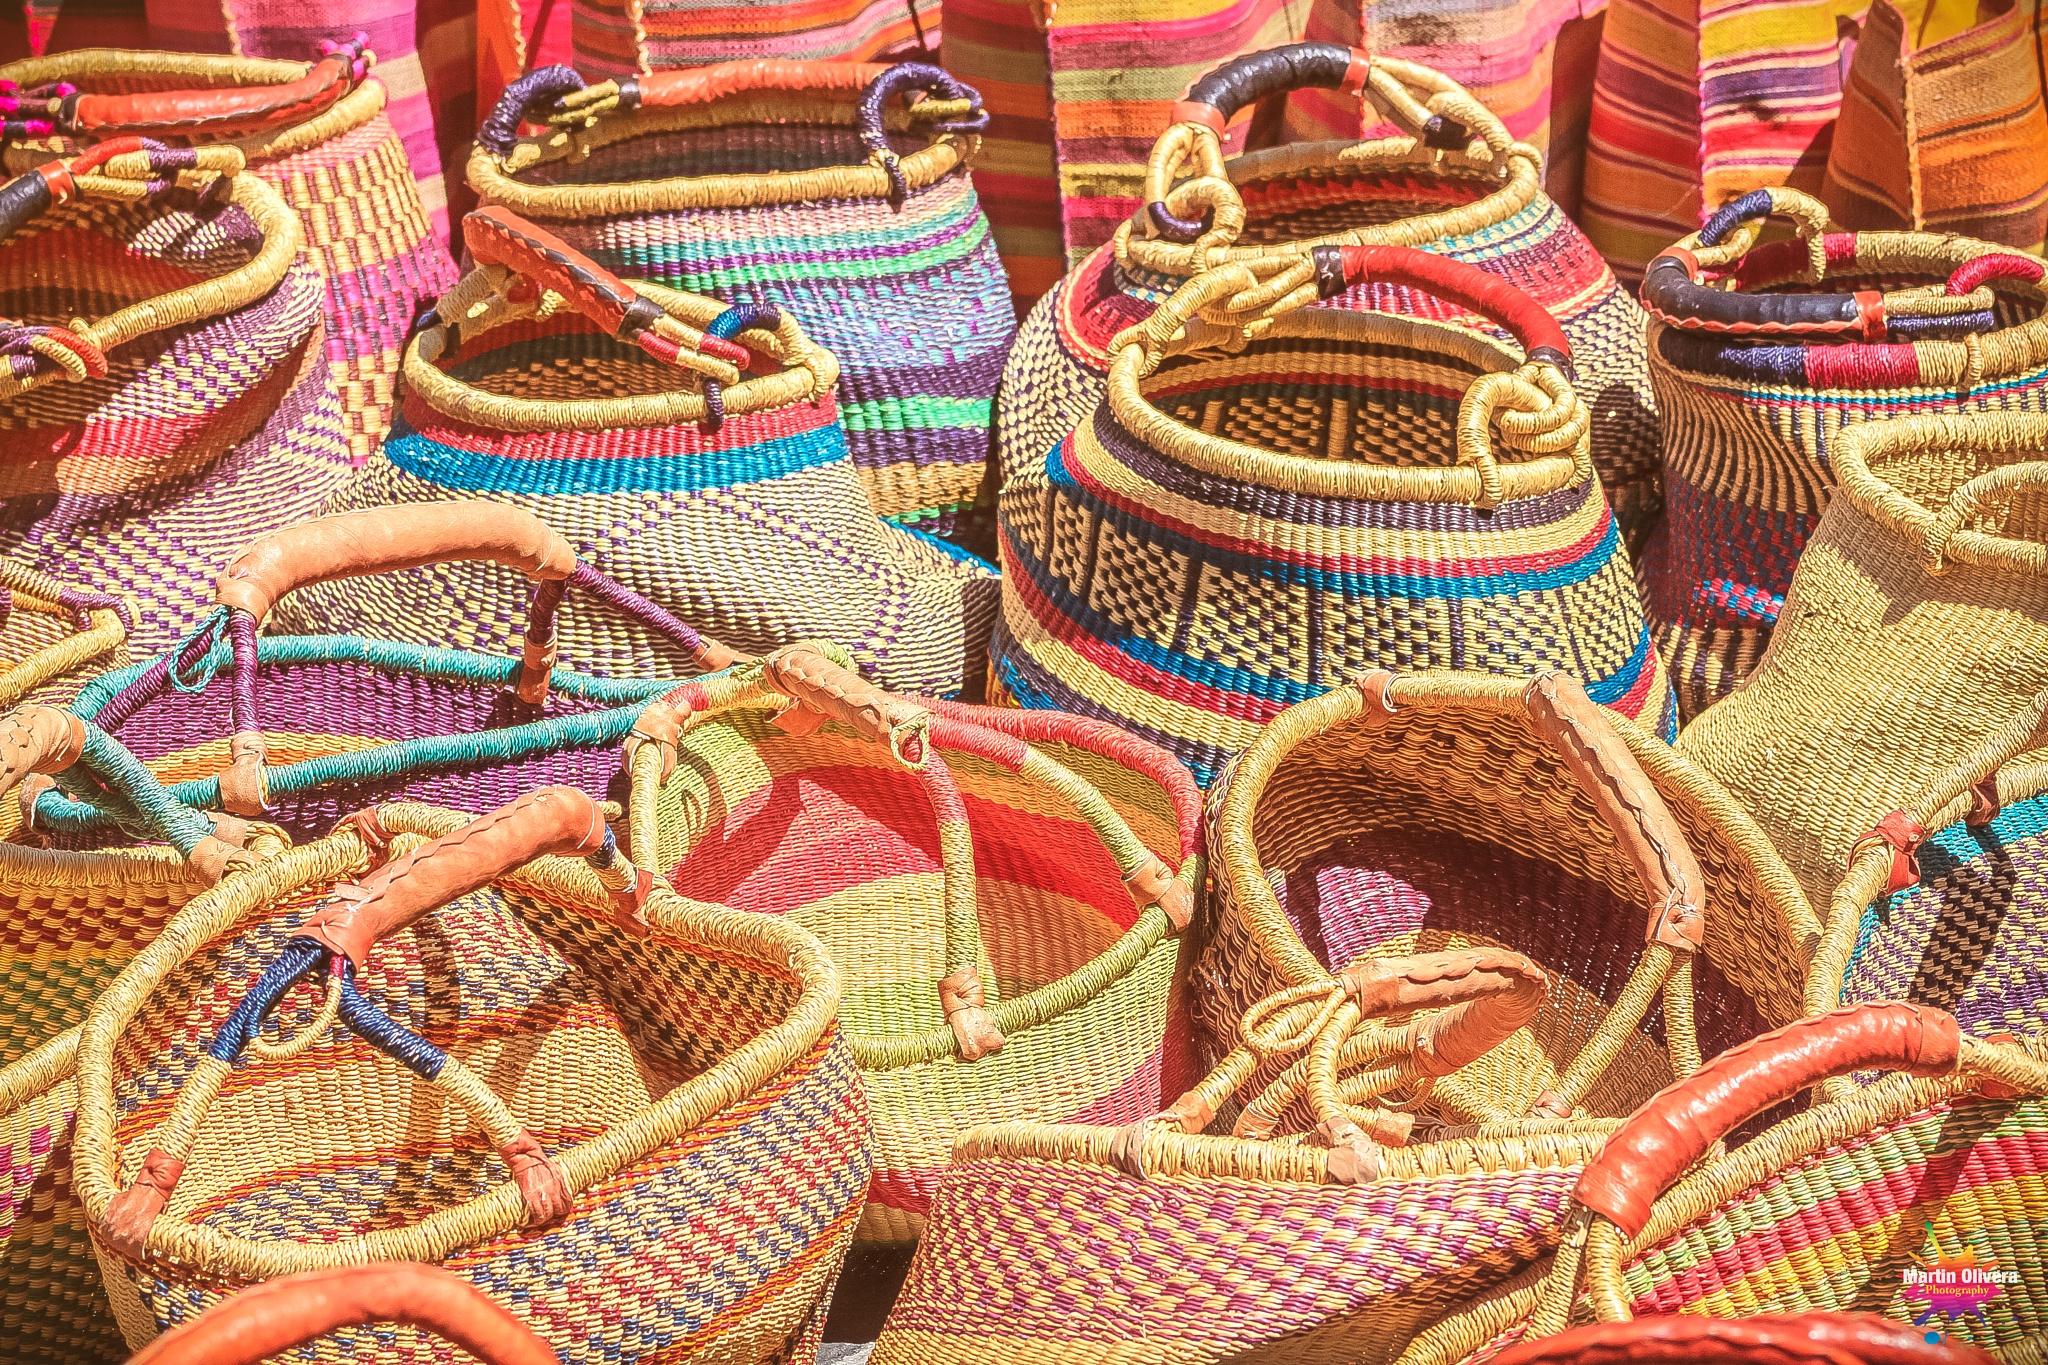 Baskets Anyone??? by Martin G. Olivera